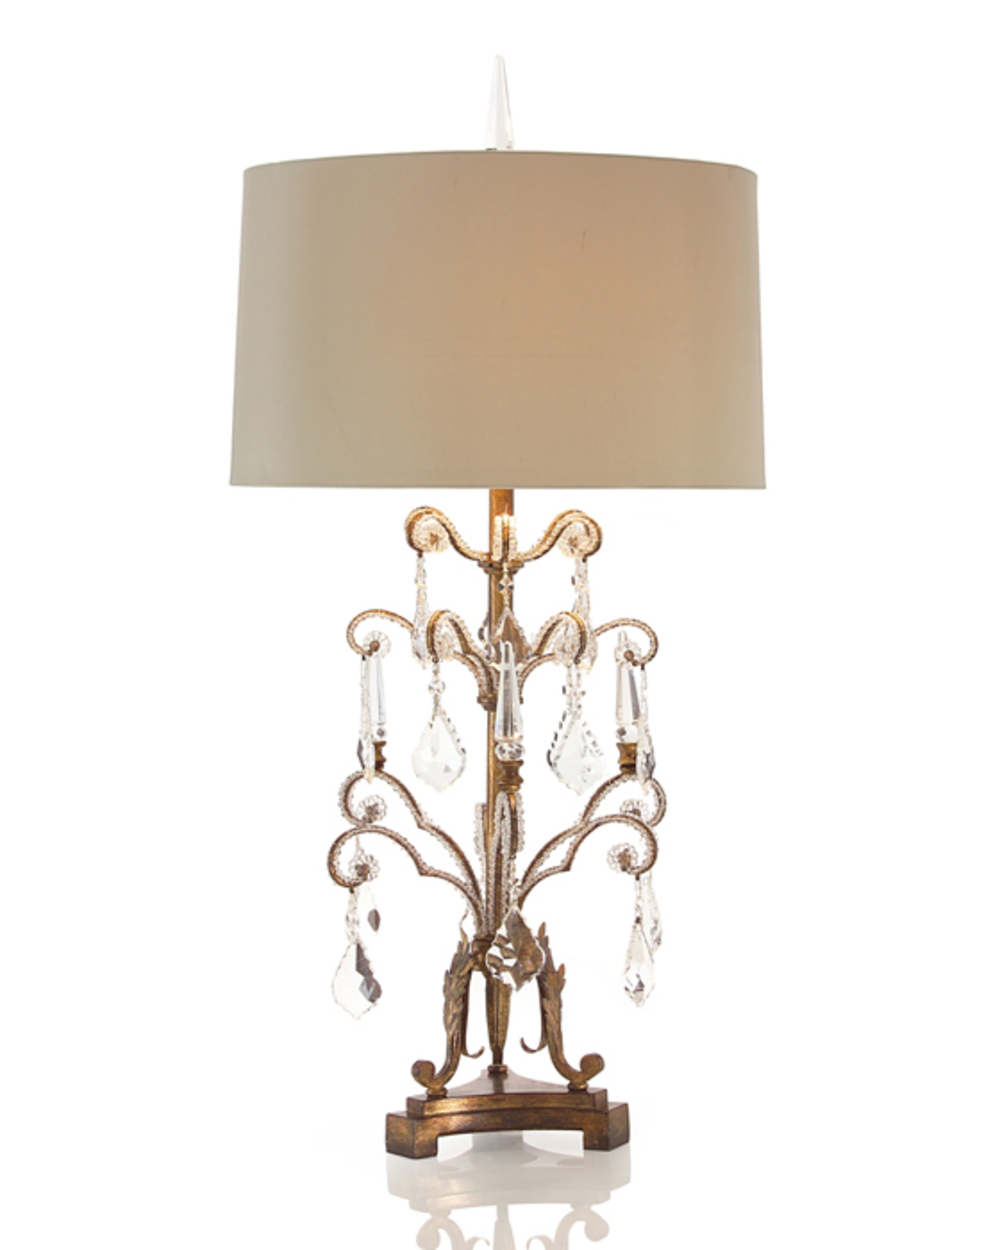 John Richard Collection - French Girandole Lamp